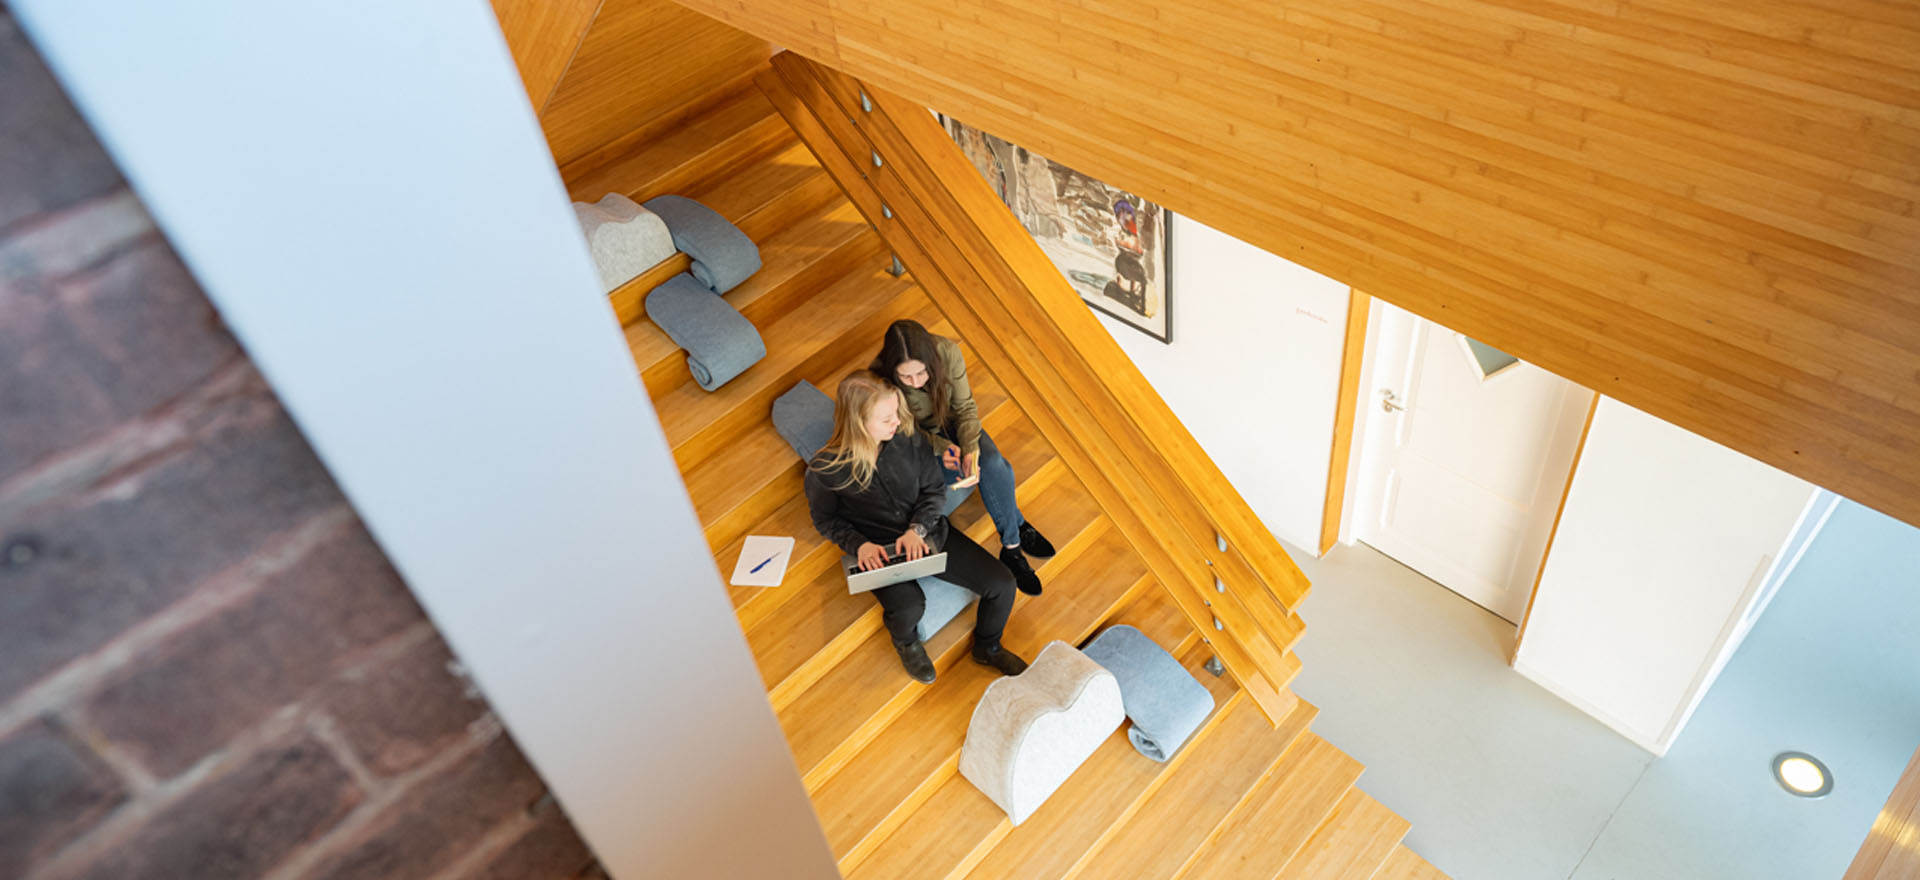 Kloosterhotel ZIN trap architectuur oude muur nieuw bamboe hout